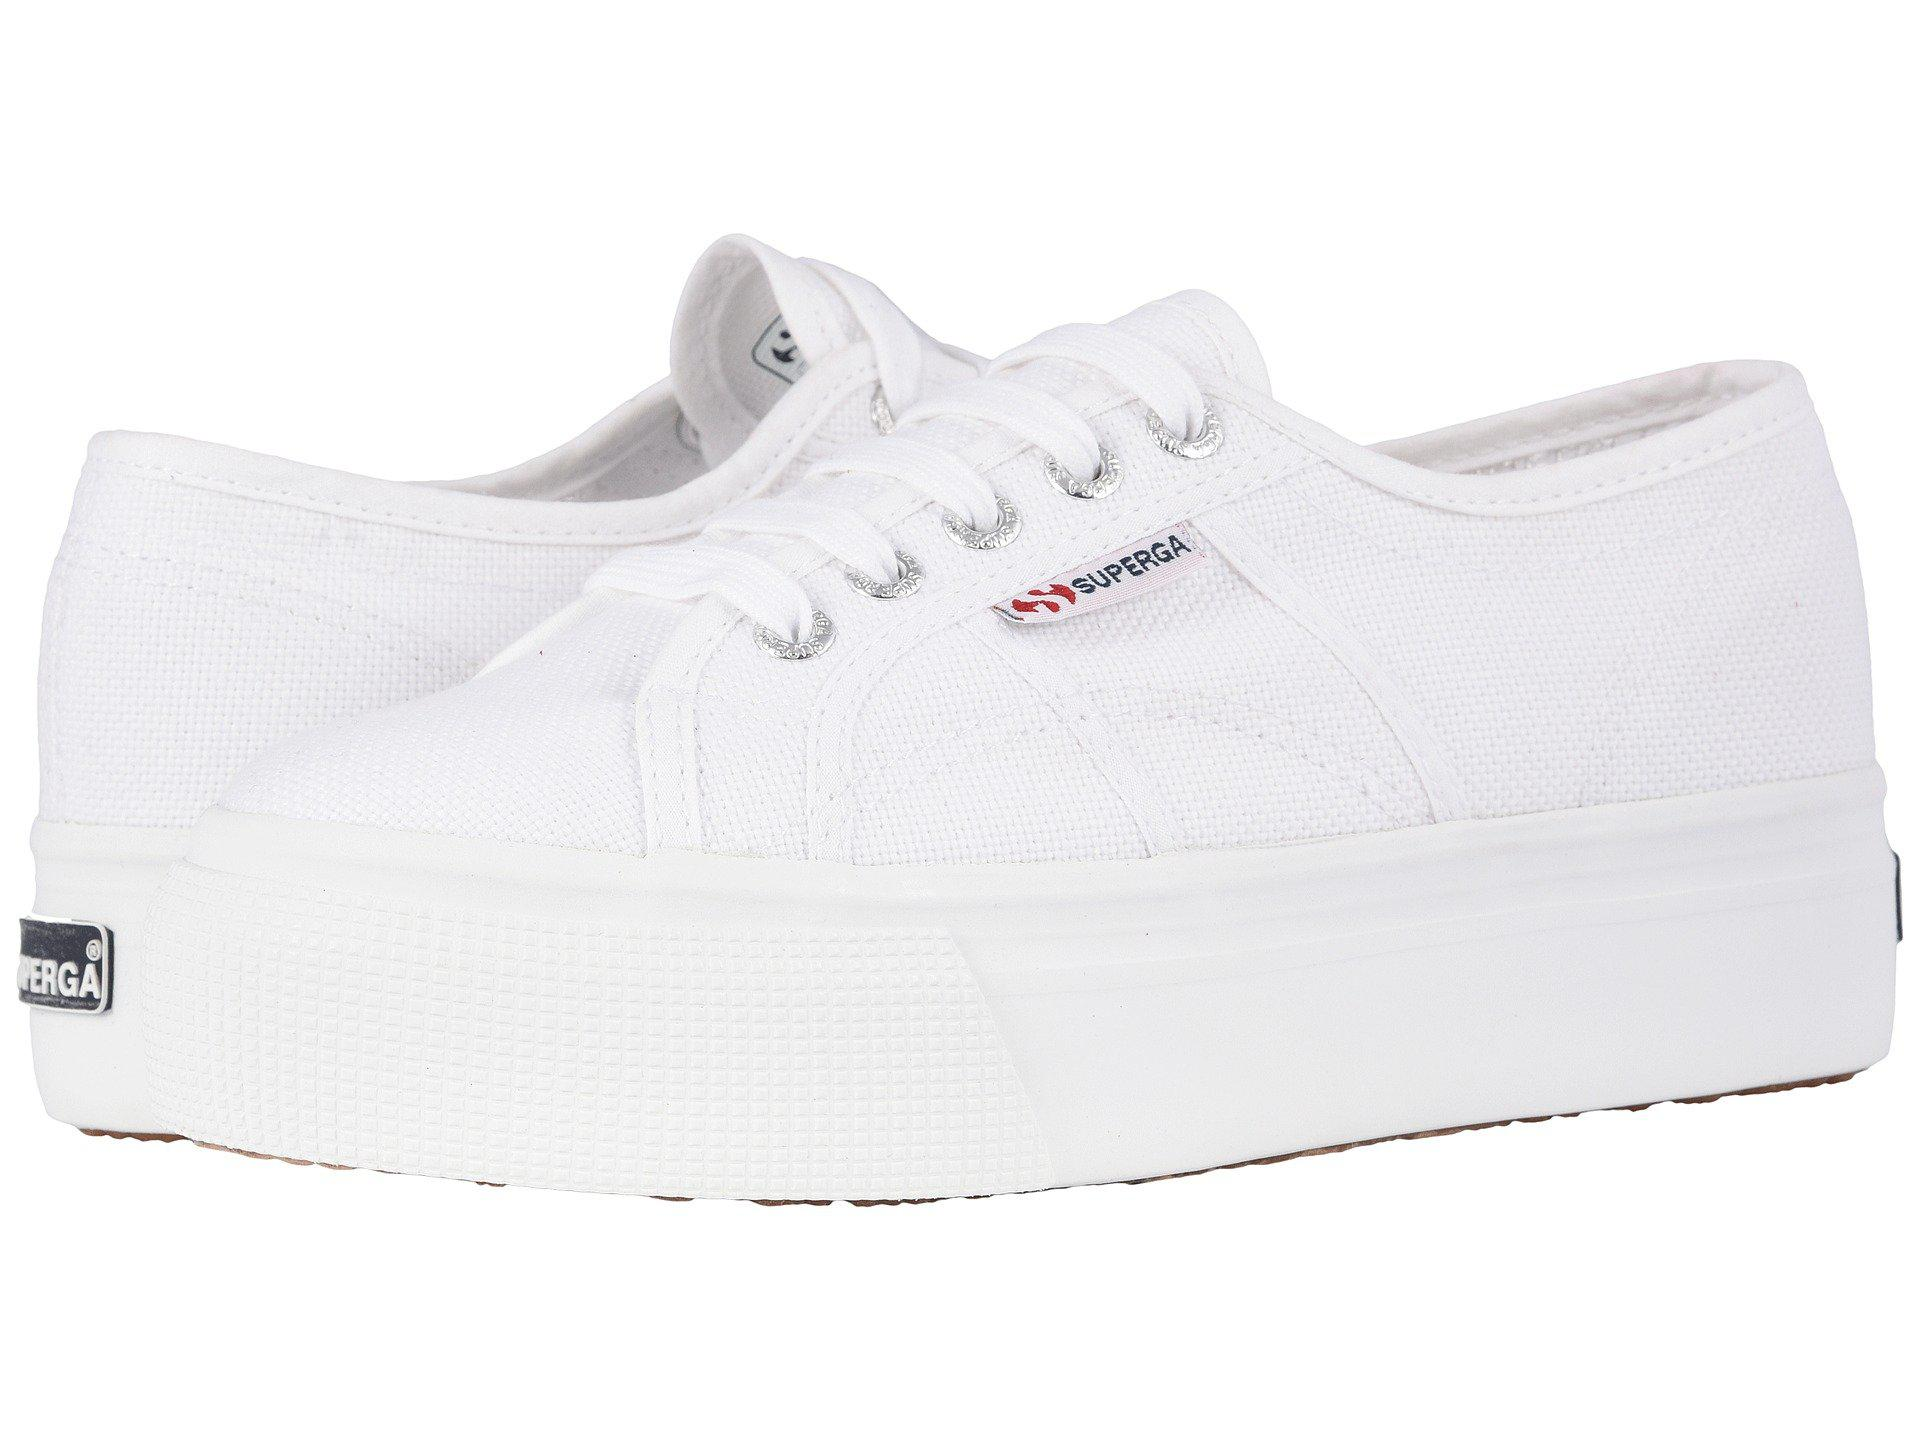 2b7d565e6b8 Superga - 2790 Acotw Platform Sneaker (white) Women s Lace Up Casual Shoes  - Lyst. View fullscreen